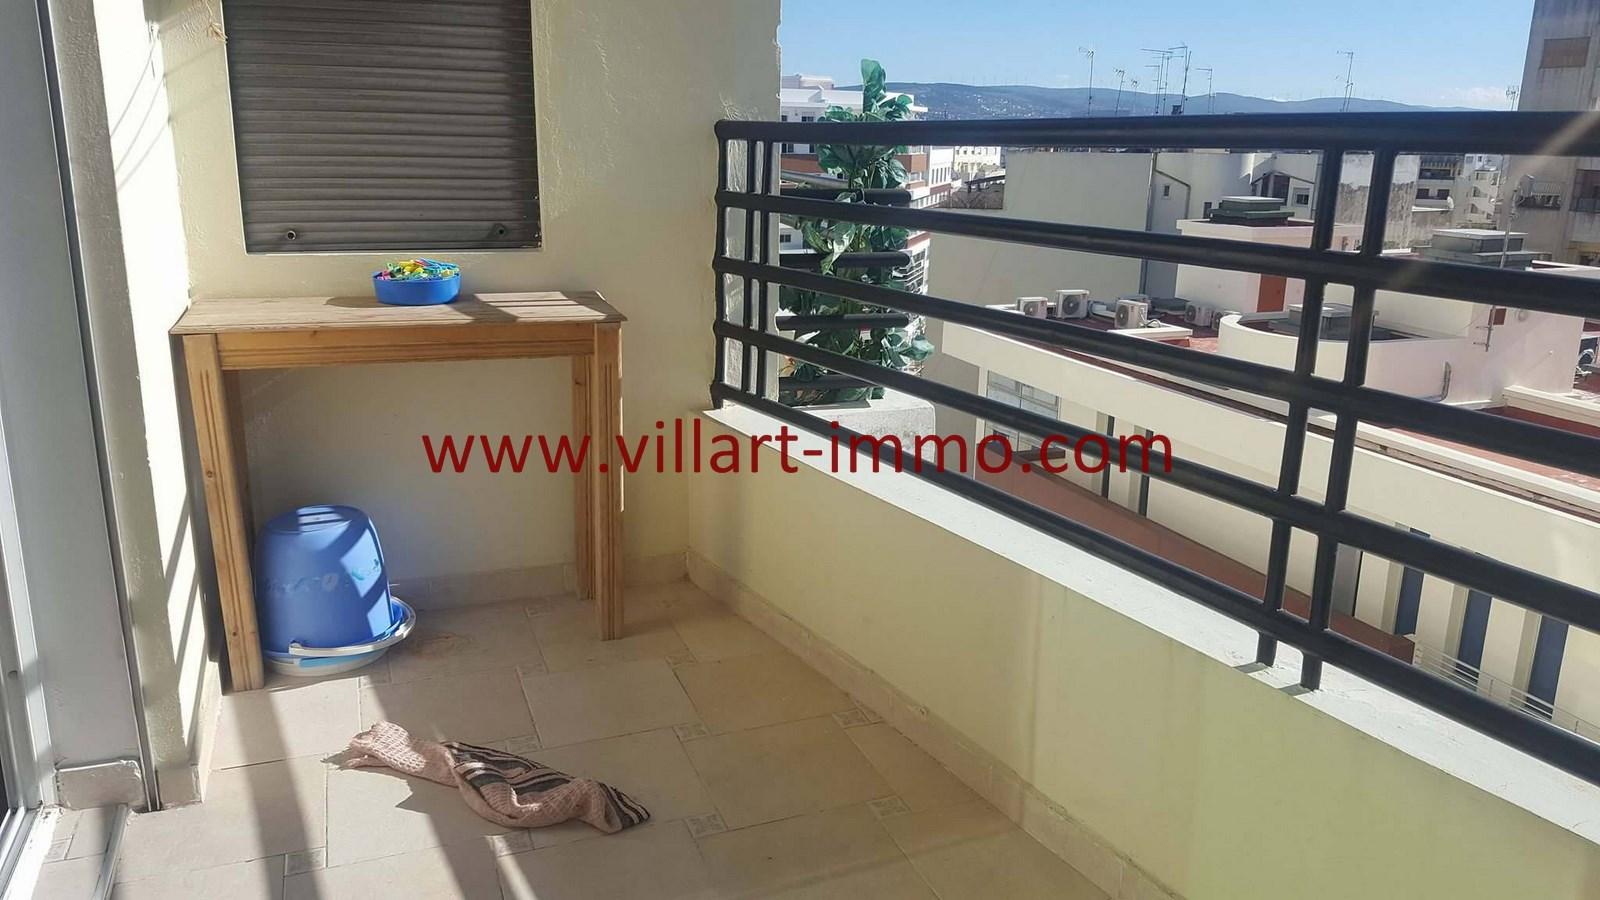 6-Vente-Appartement-Centre-ville-Tanger-Balcon 1-VA531-Villart Immo